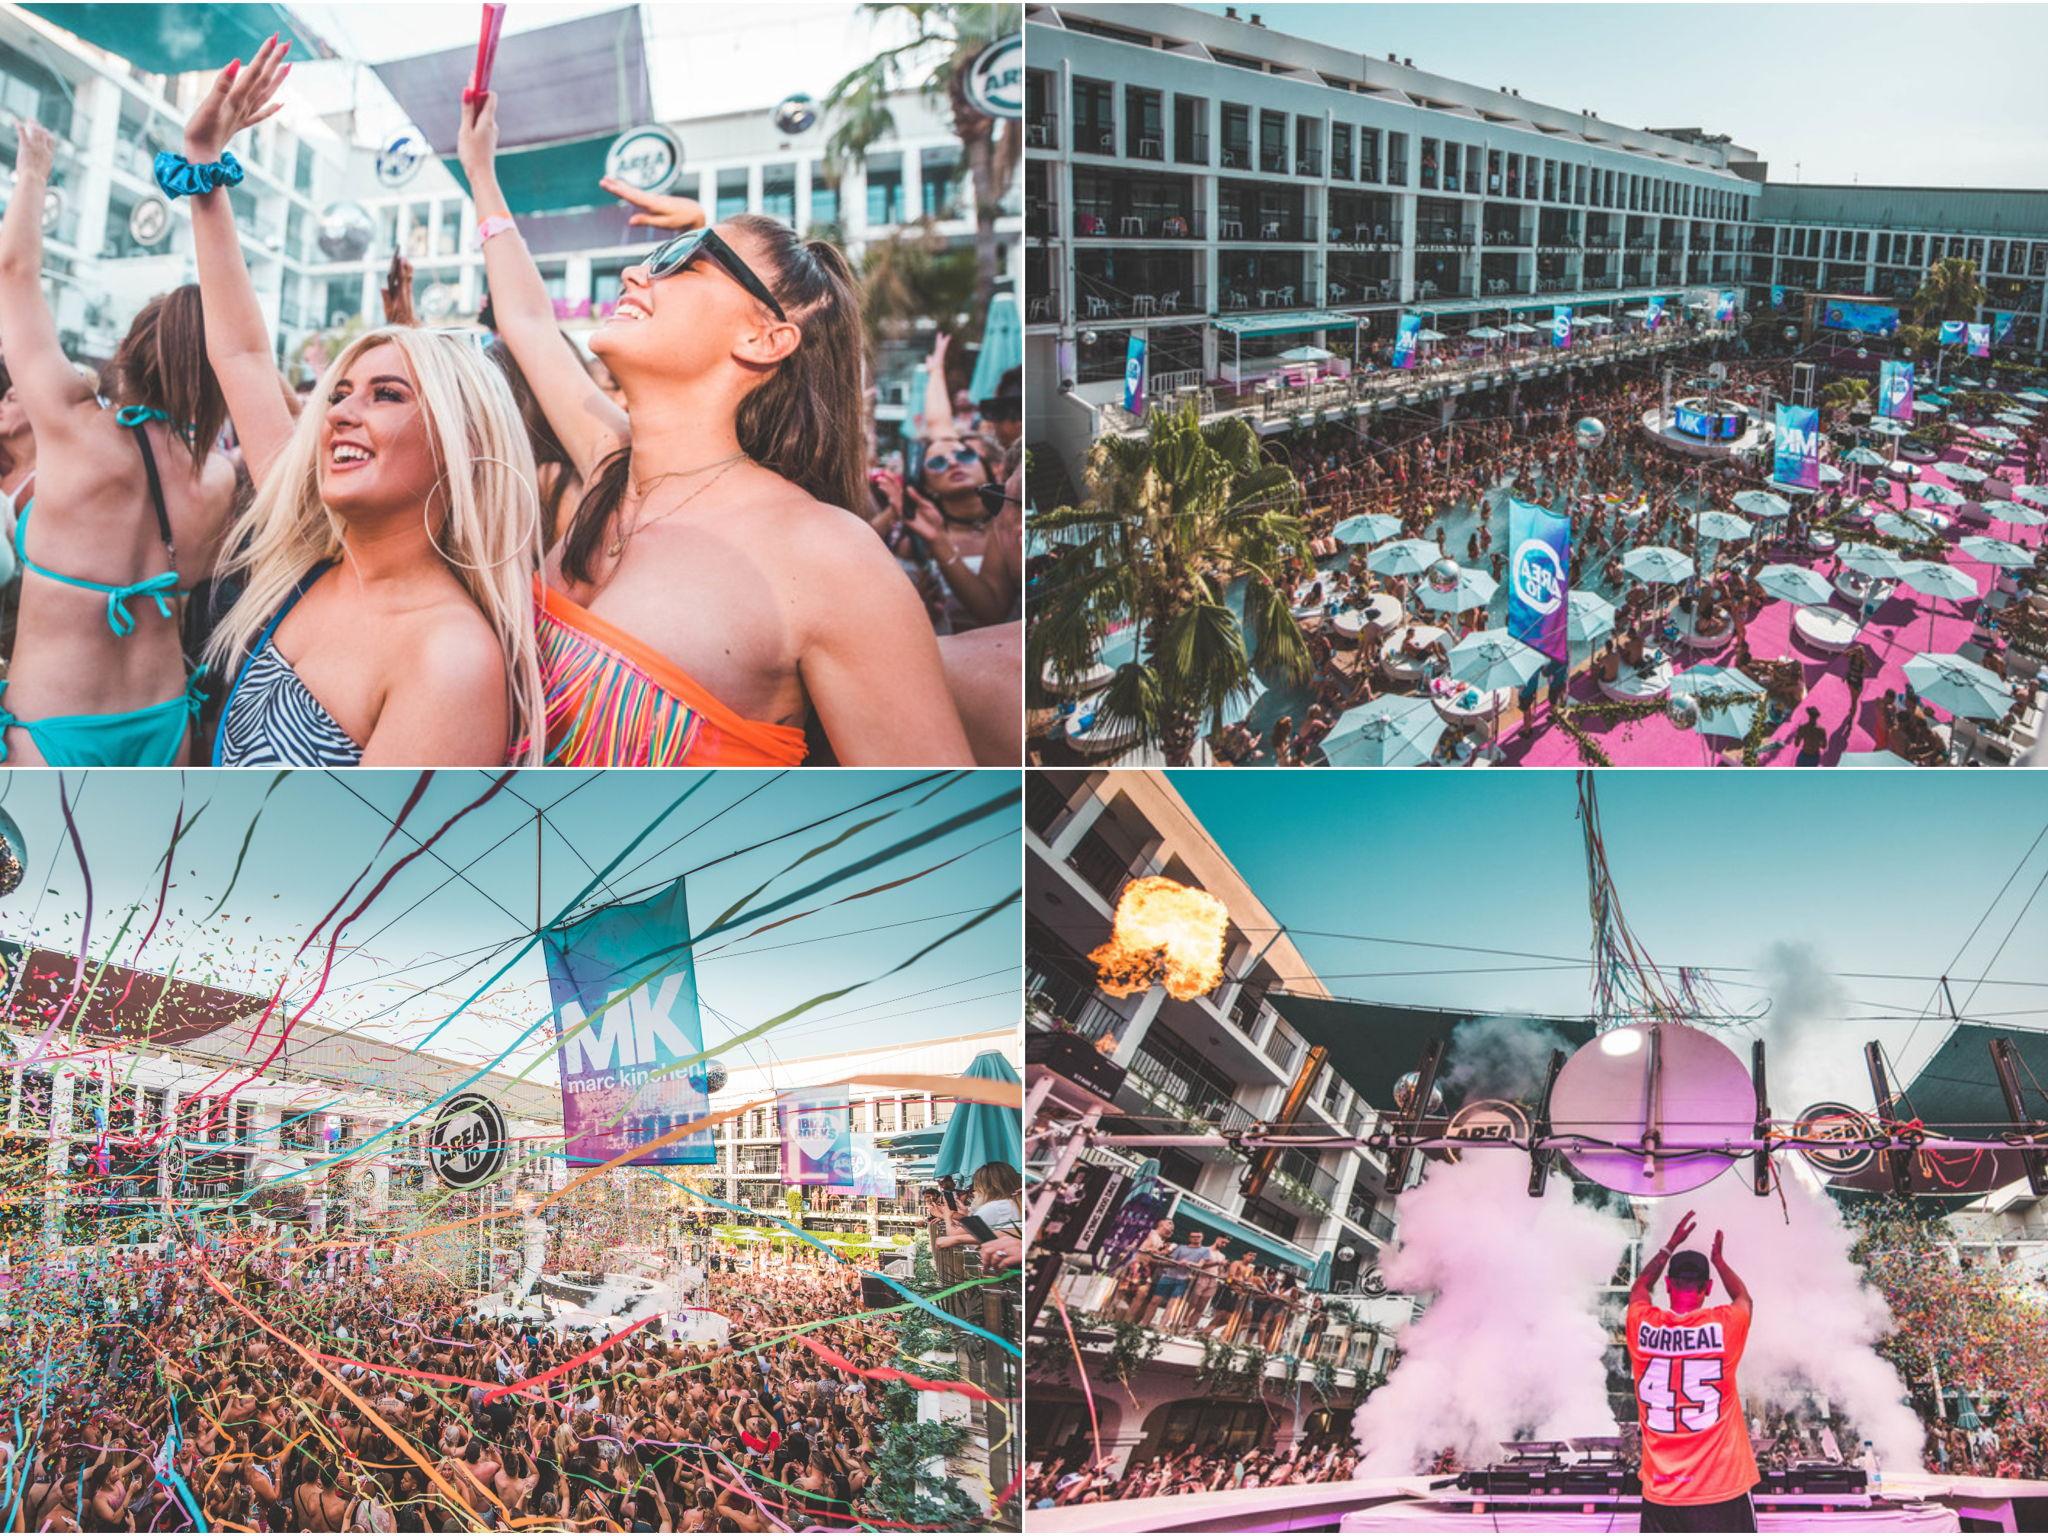 Area 10 MK pool party Ibiza rocks image gallery